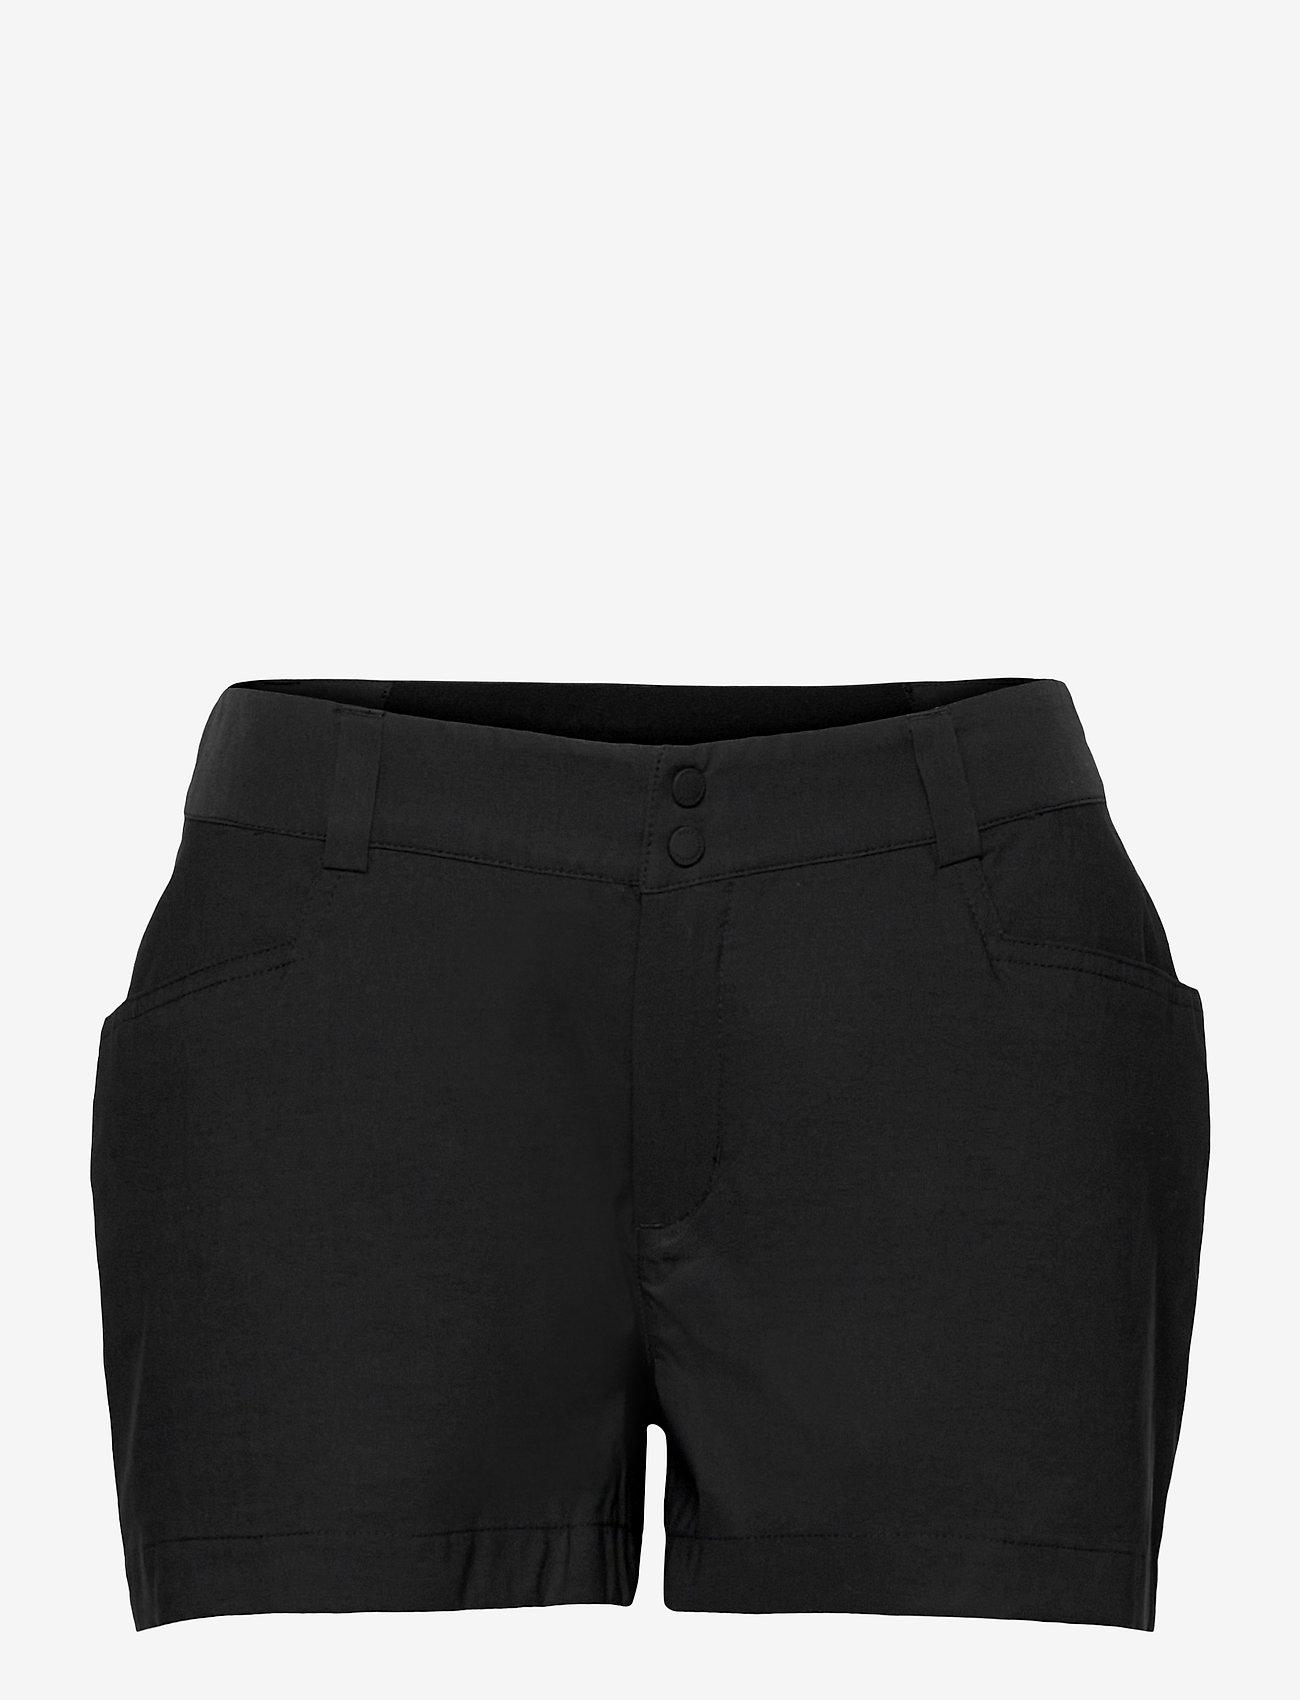 Peak Performance - W Iconiq Shorts - wandel korte broek - black - 0